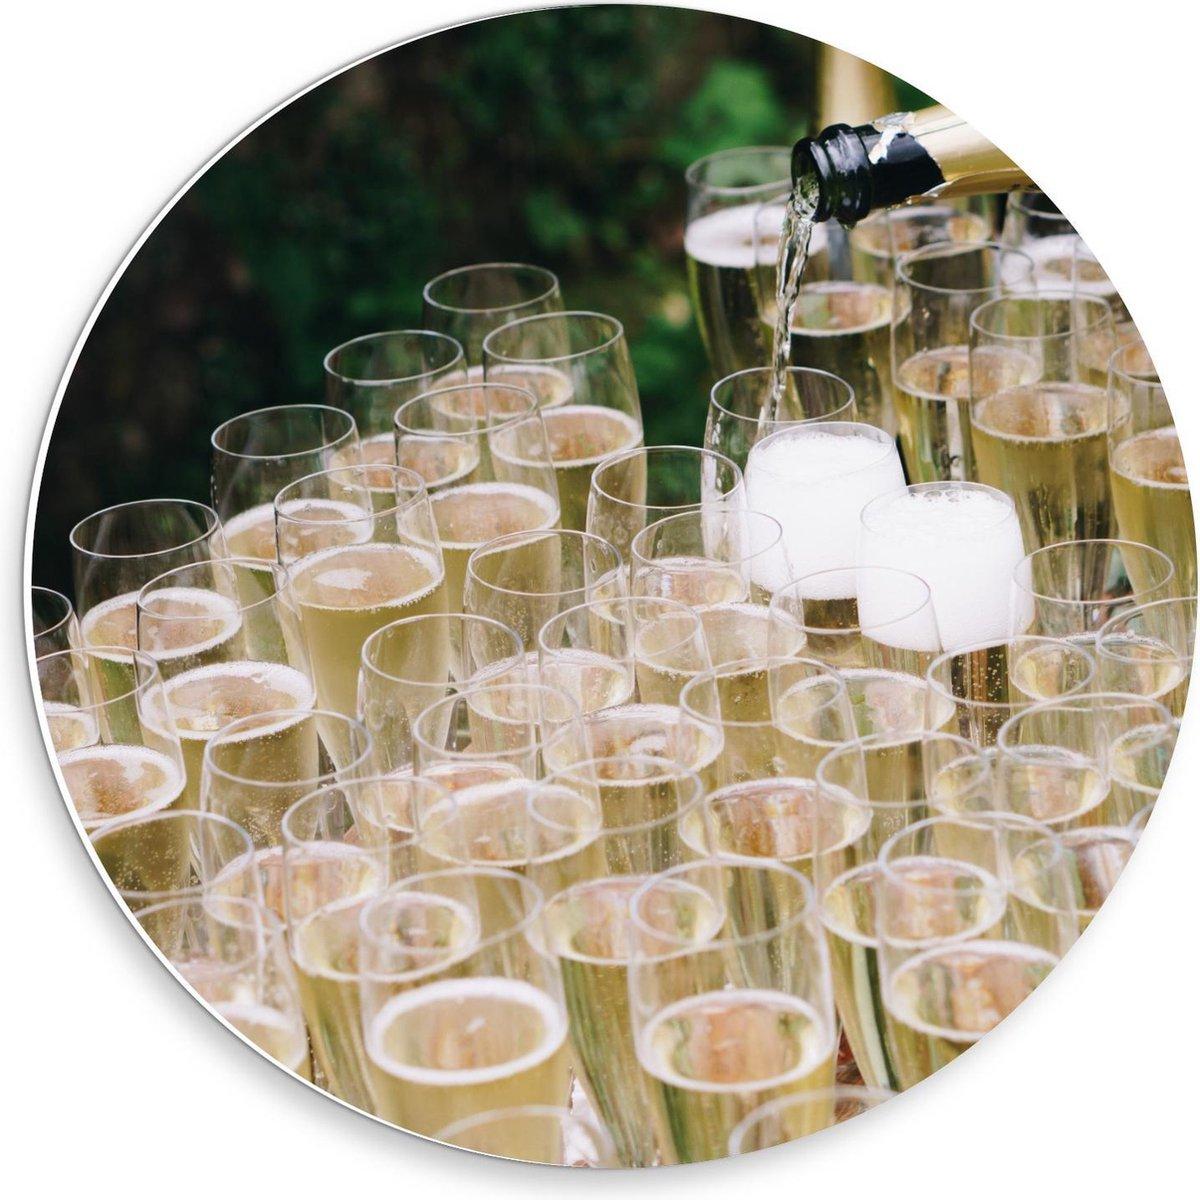 Forex Wandcirkel - Veel Glazen Champagne - 30x30cm Foto op Wandcirkel (met ophangsysteem)